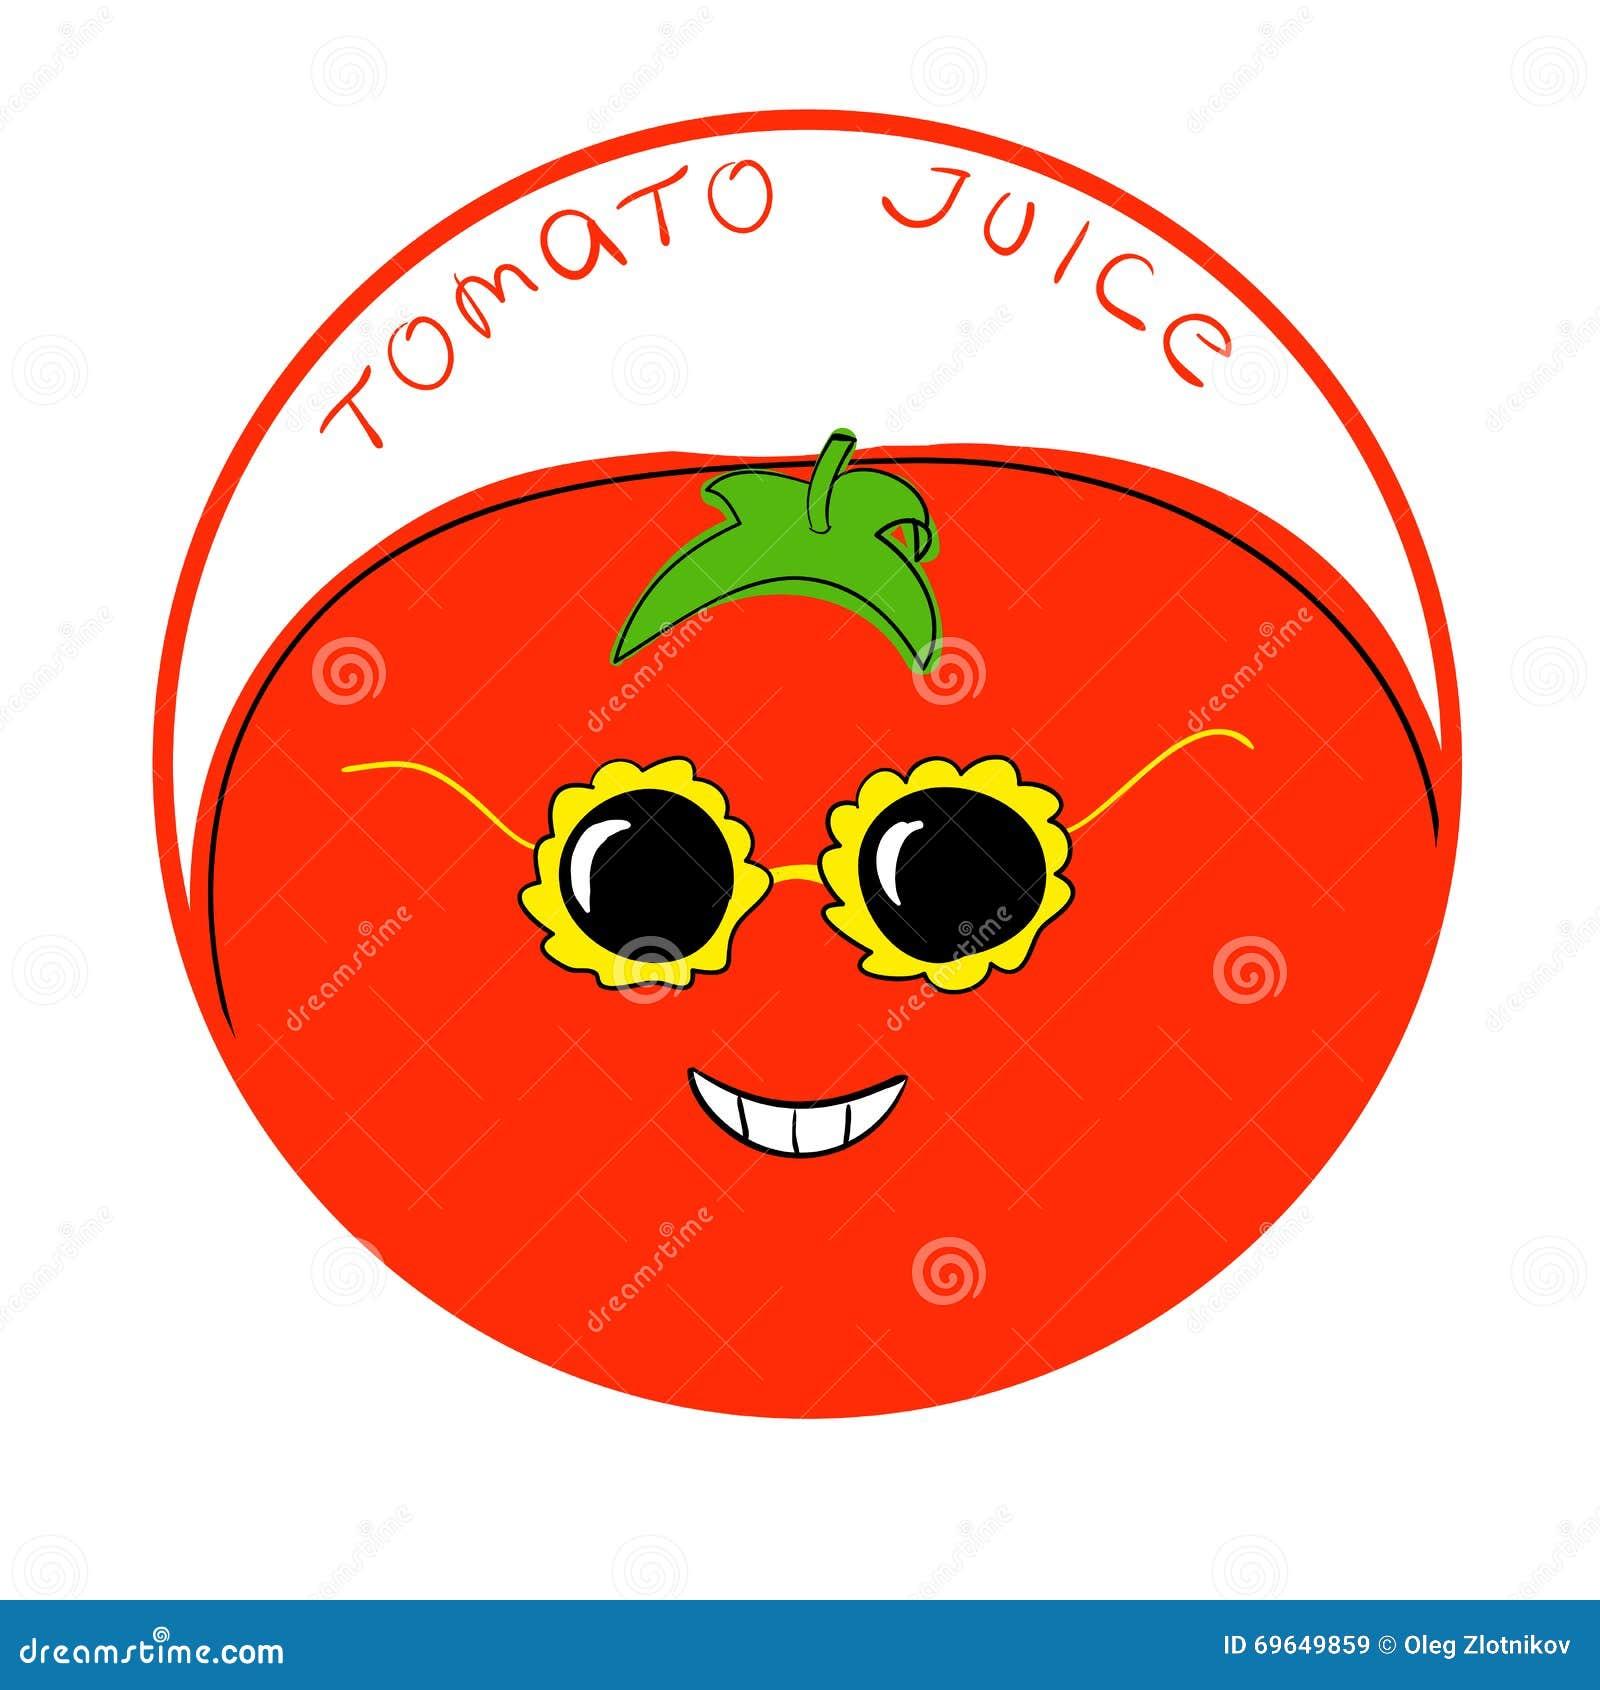 Cartoon Tomato Juice Car Pictures - Car Canyon